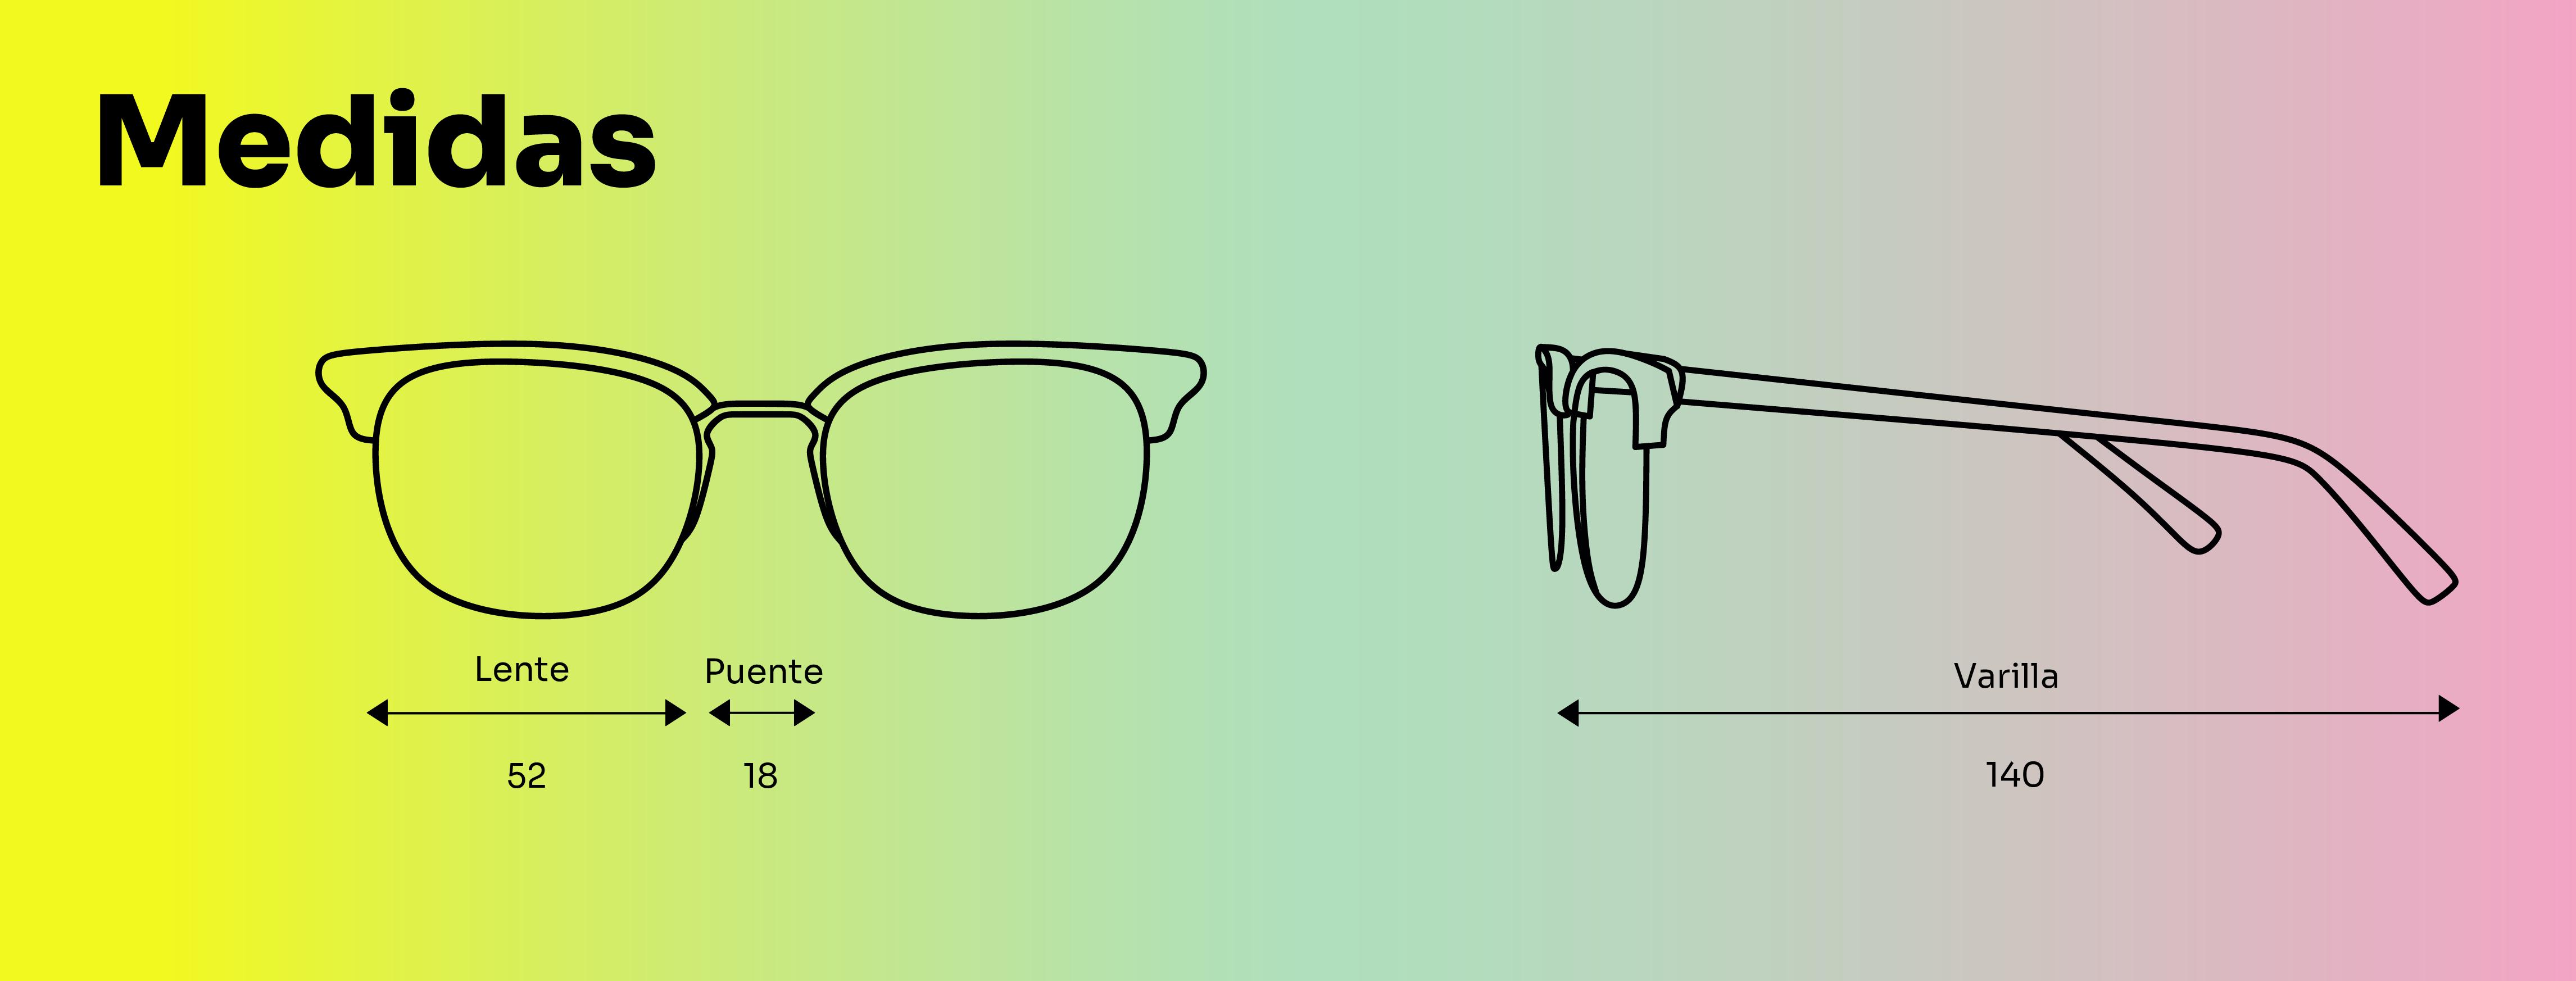 medidas-montura-de-gafas-graduadas-de-marca-Fest